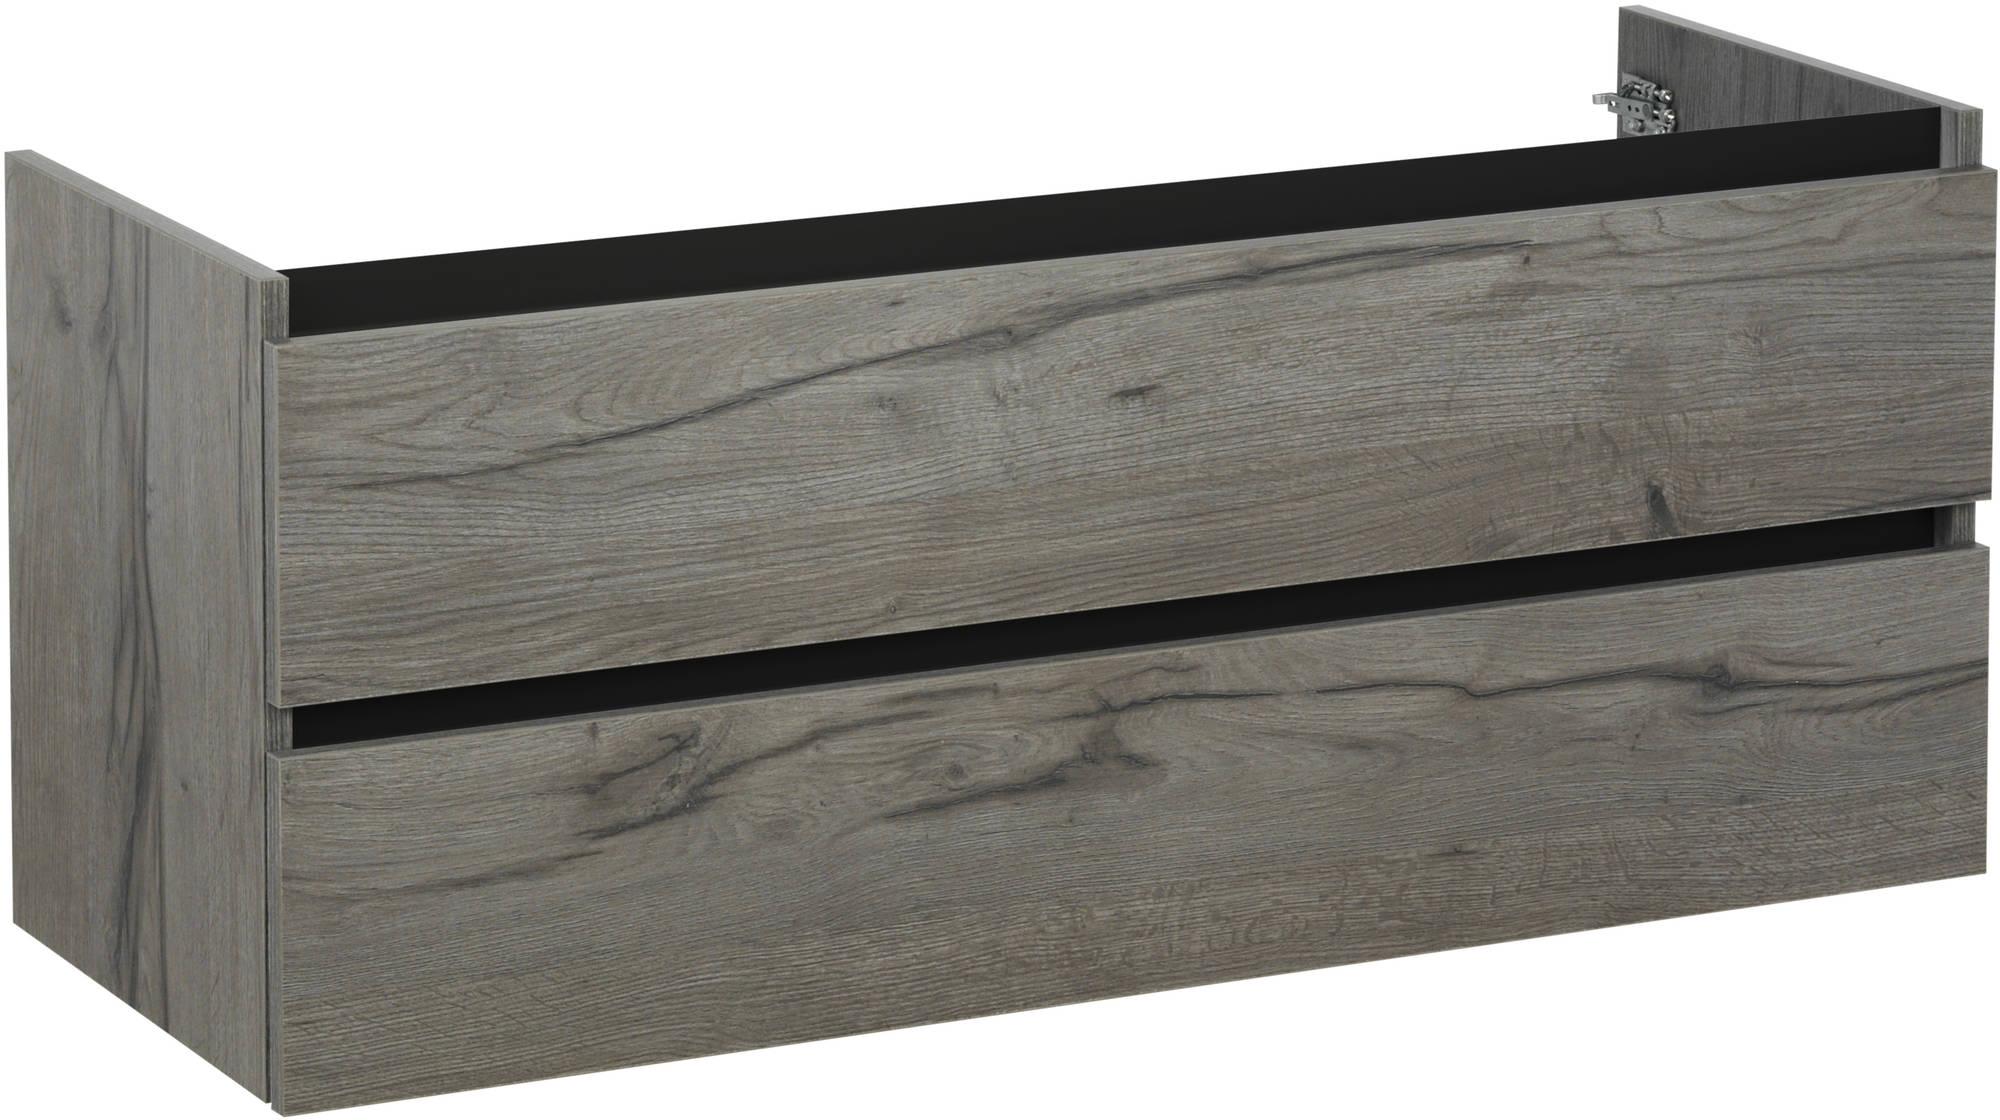 Ben Limara Wastafelonderkast 2 laden, 140x44,5x50 cm, Cape Elm/Mat Zwart